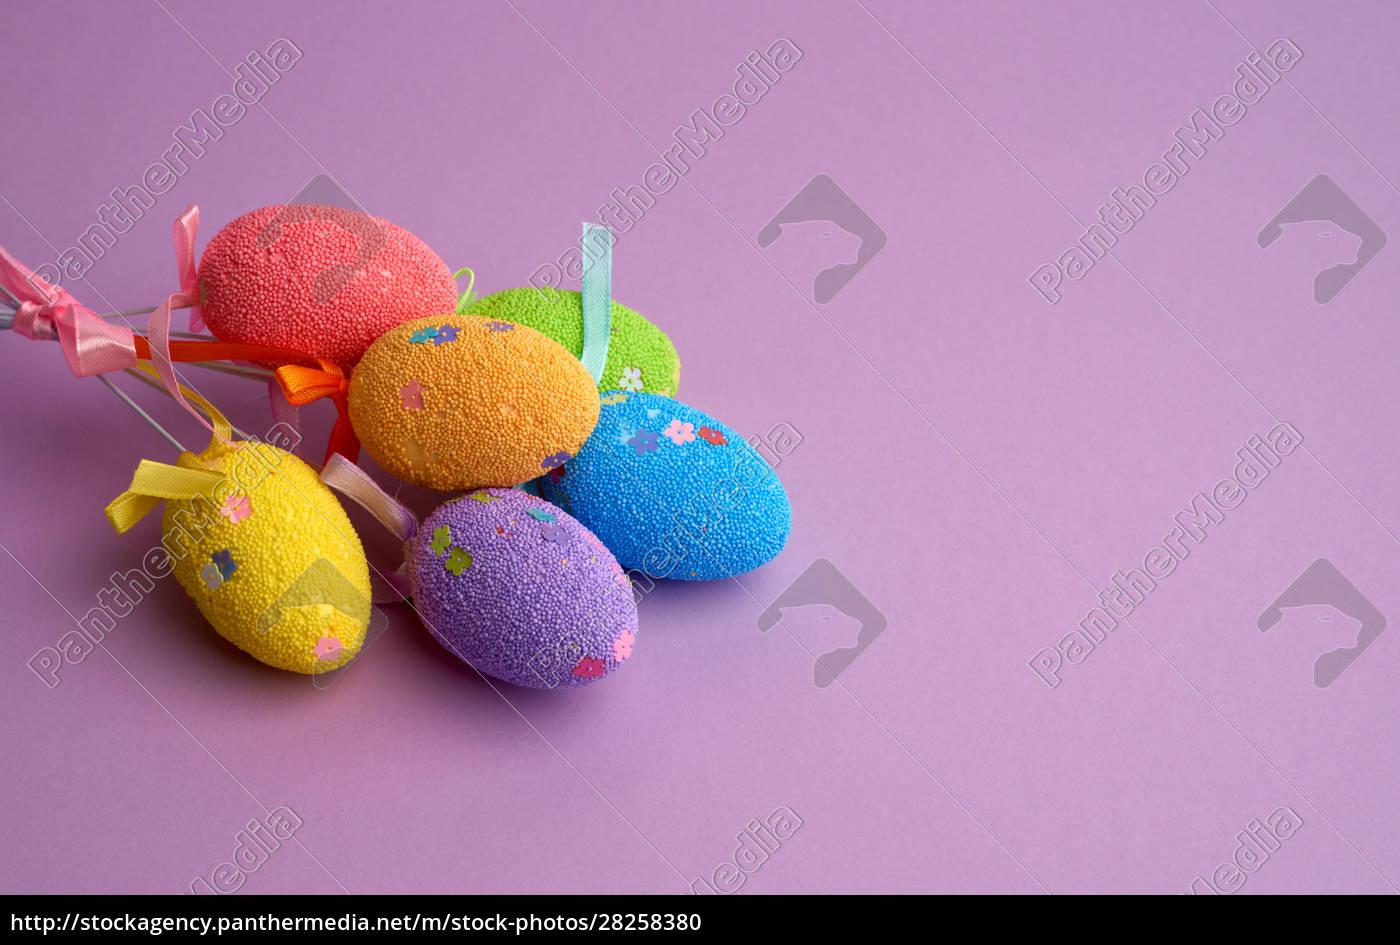 multi-colored, decorative, easter, eggs, on, sticks - 28258380